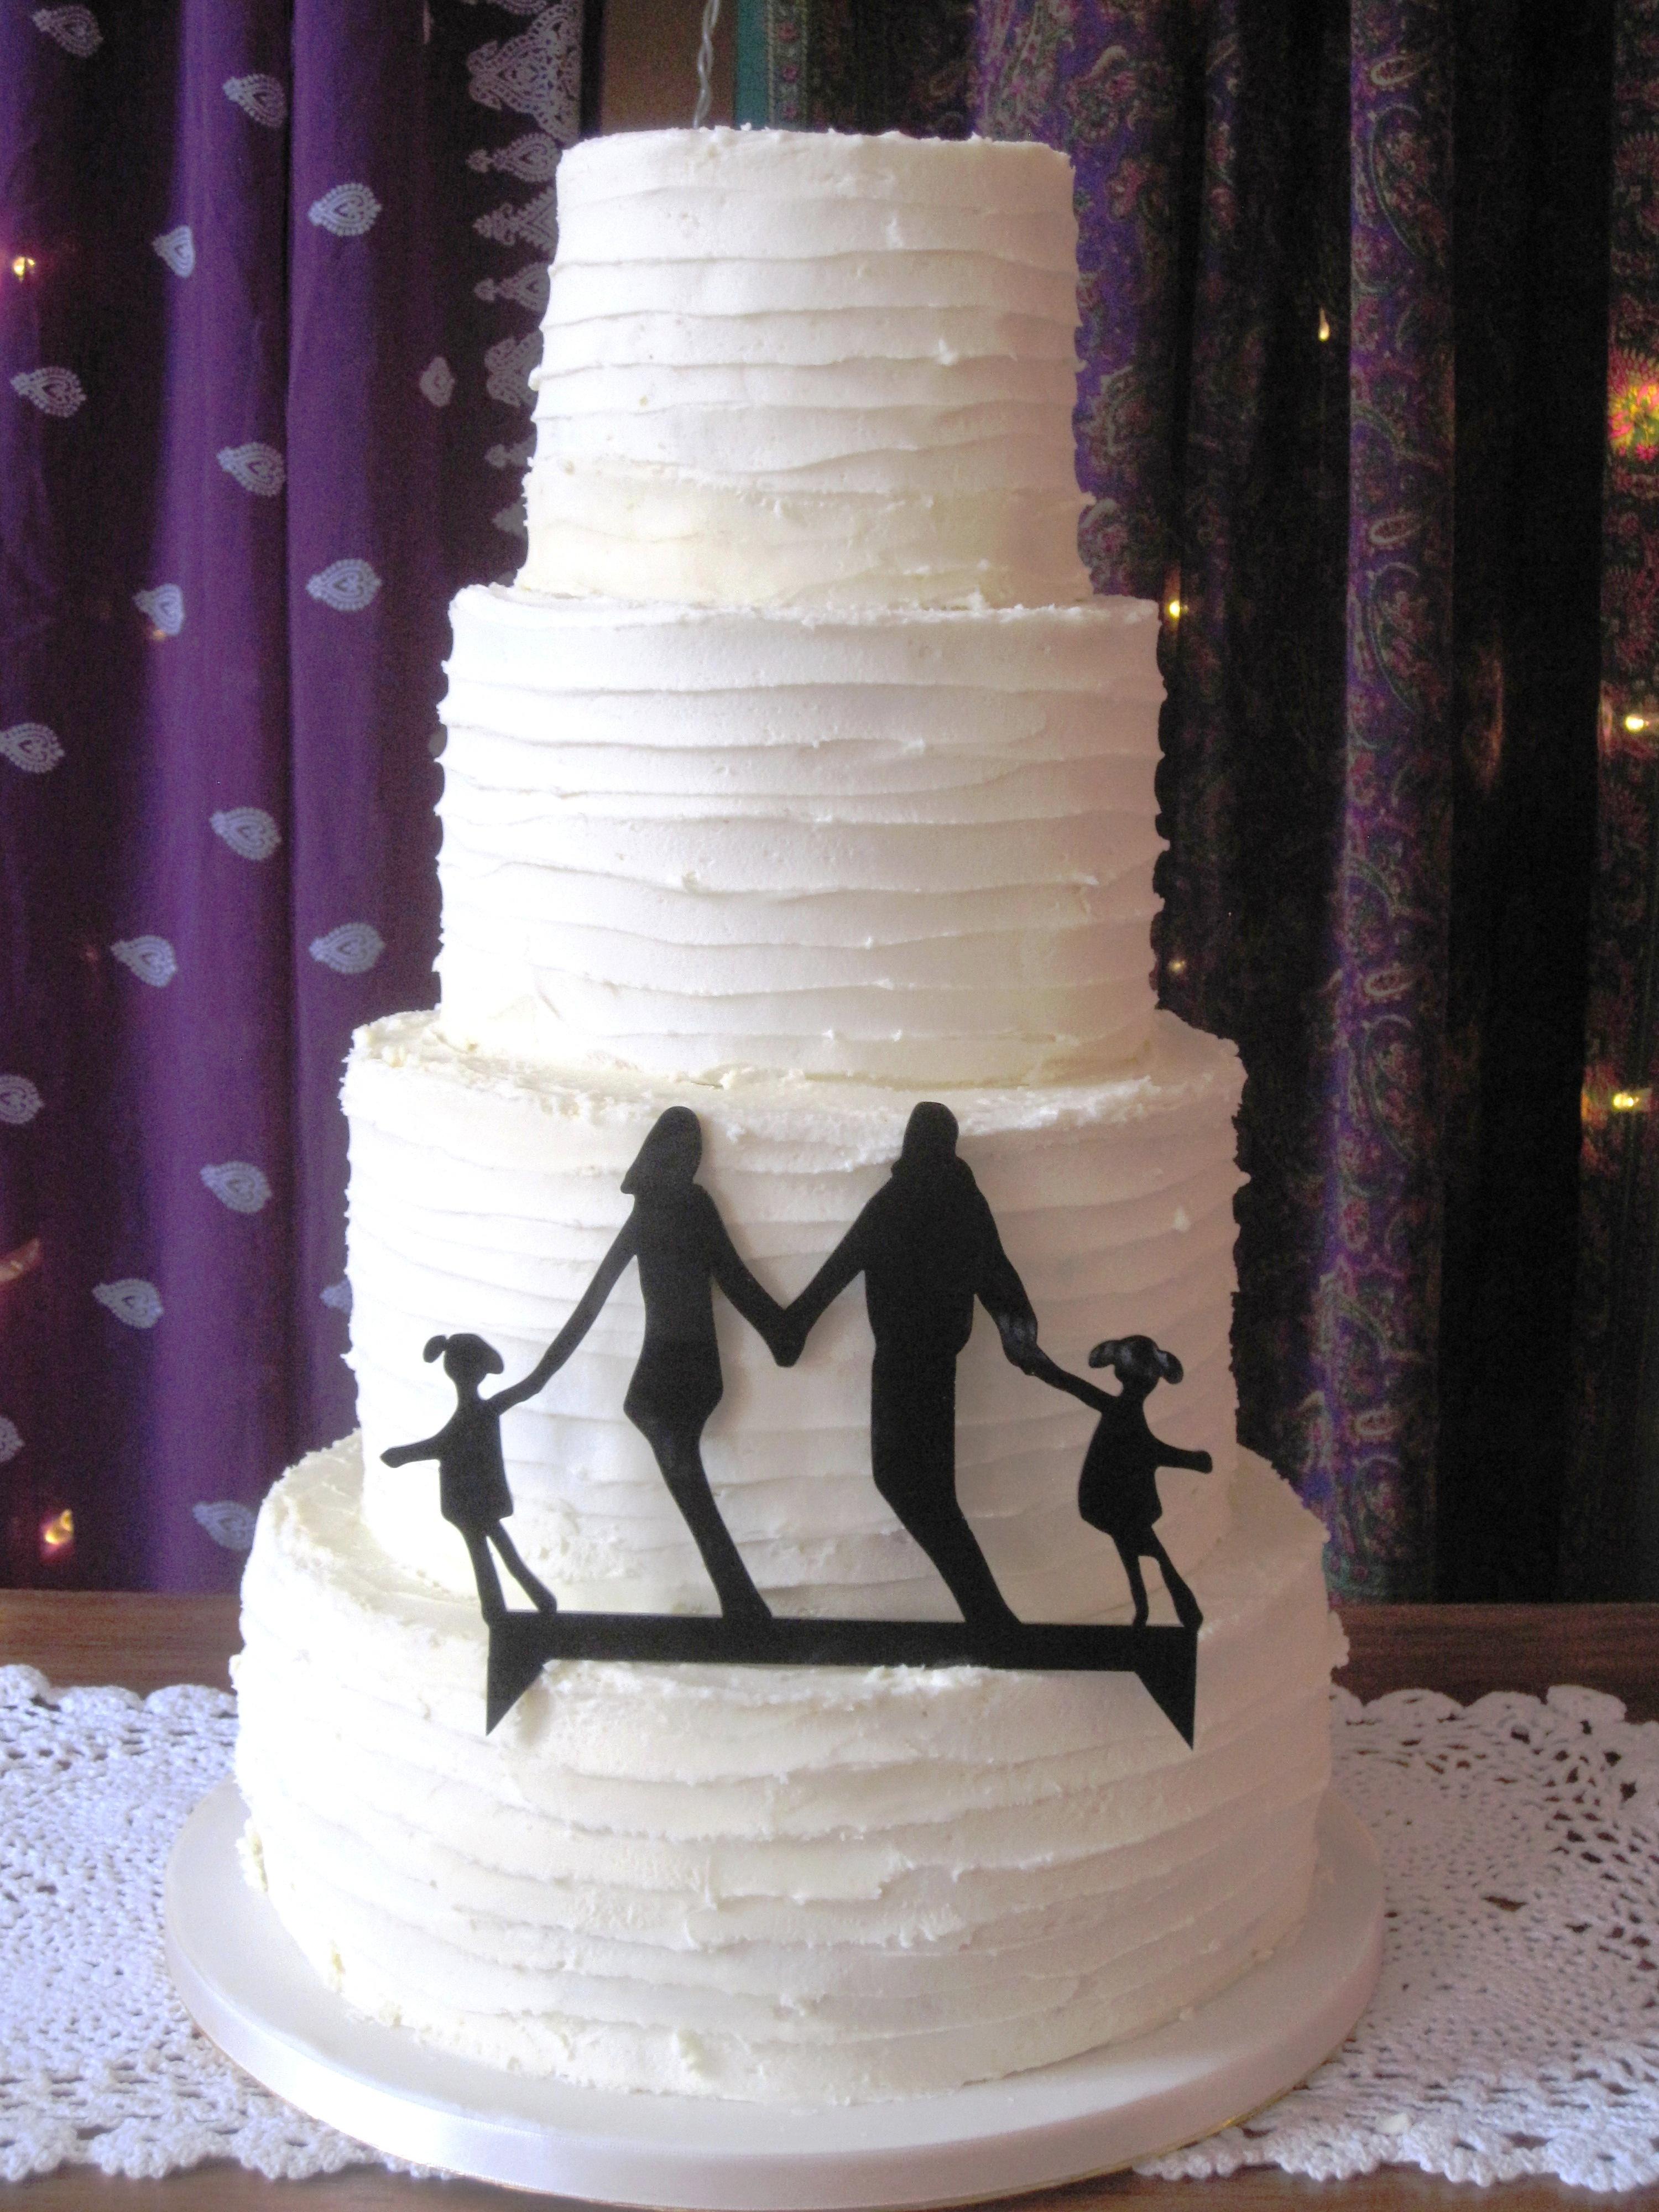 Ivory Rustic Buttercream Wedding Cake